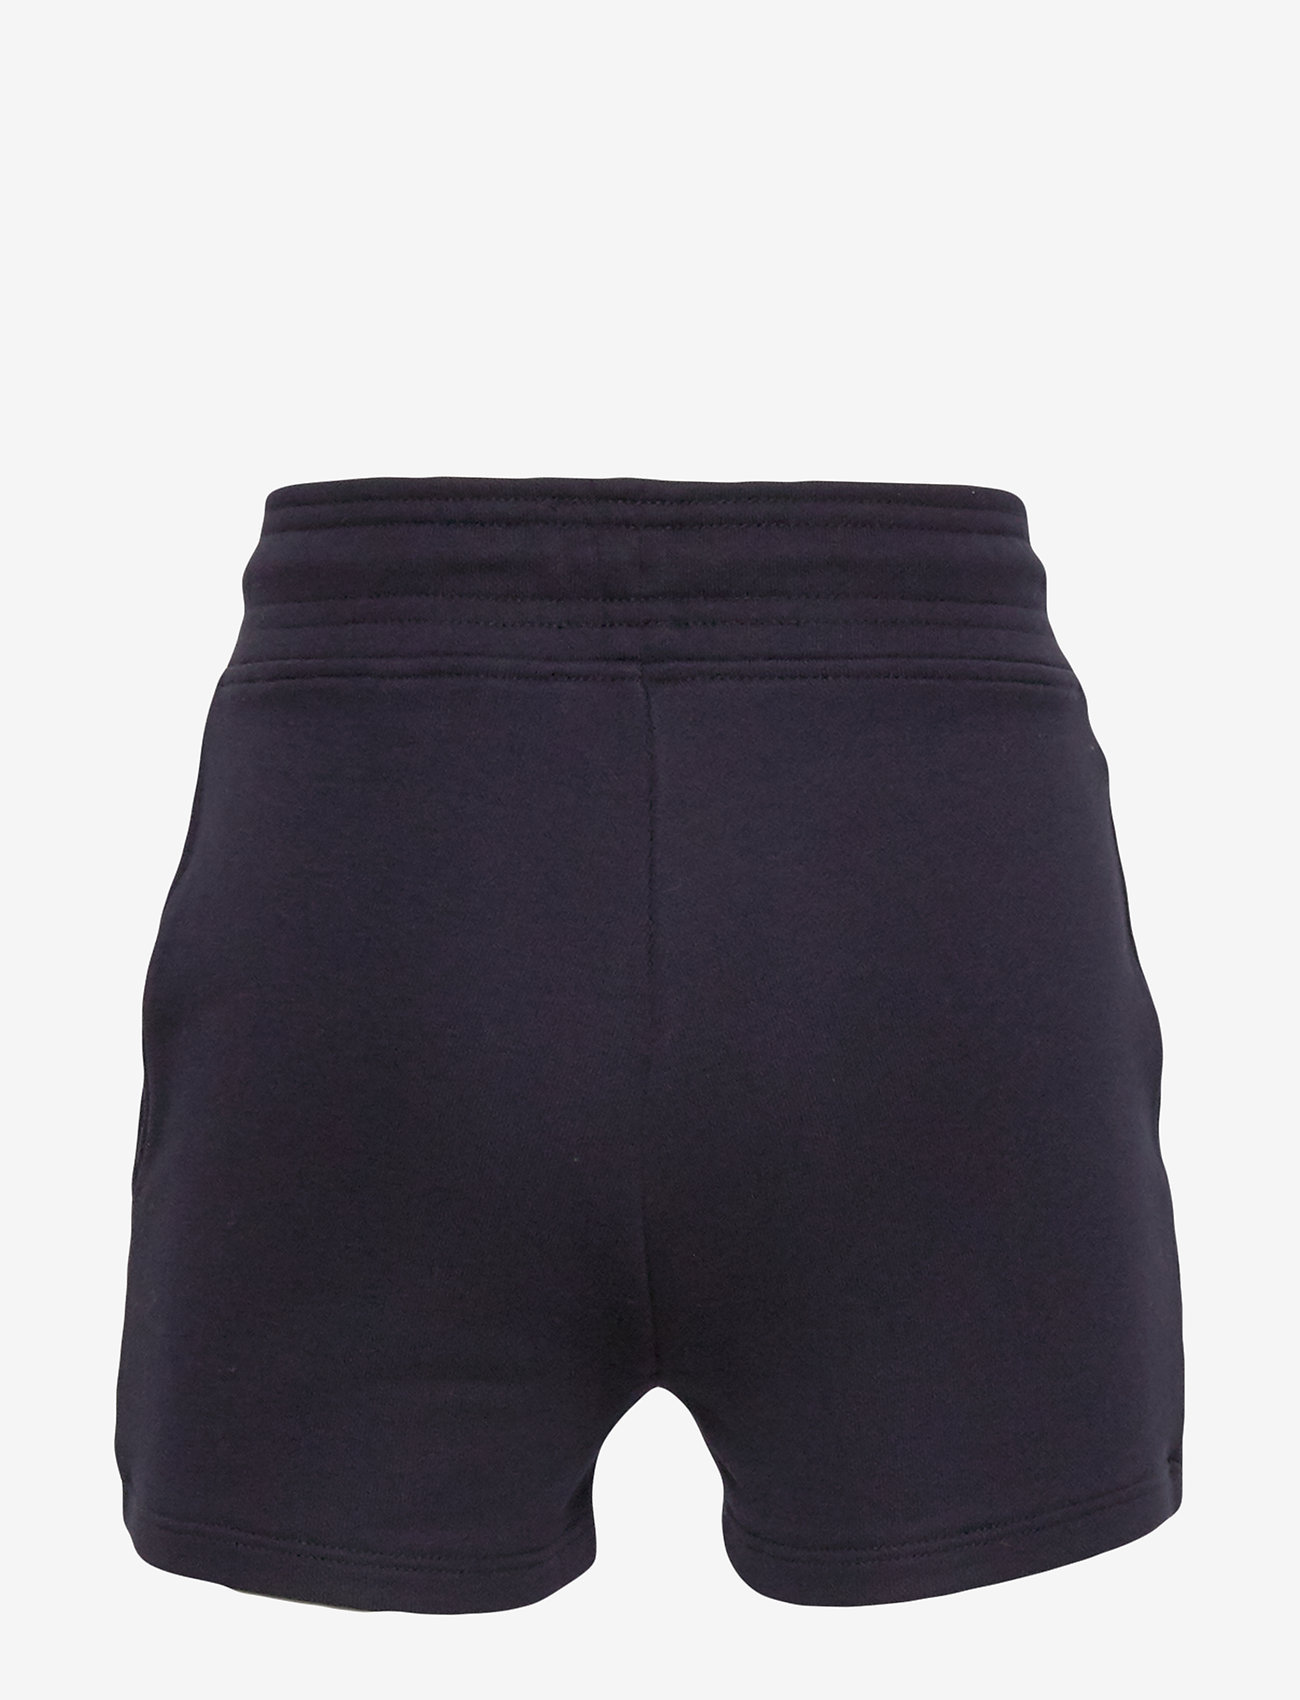 GANT - THE ORIGINAL SWEAT SHORTS - shorts - evening blue - 1